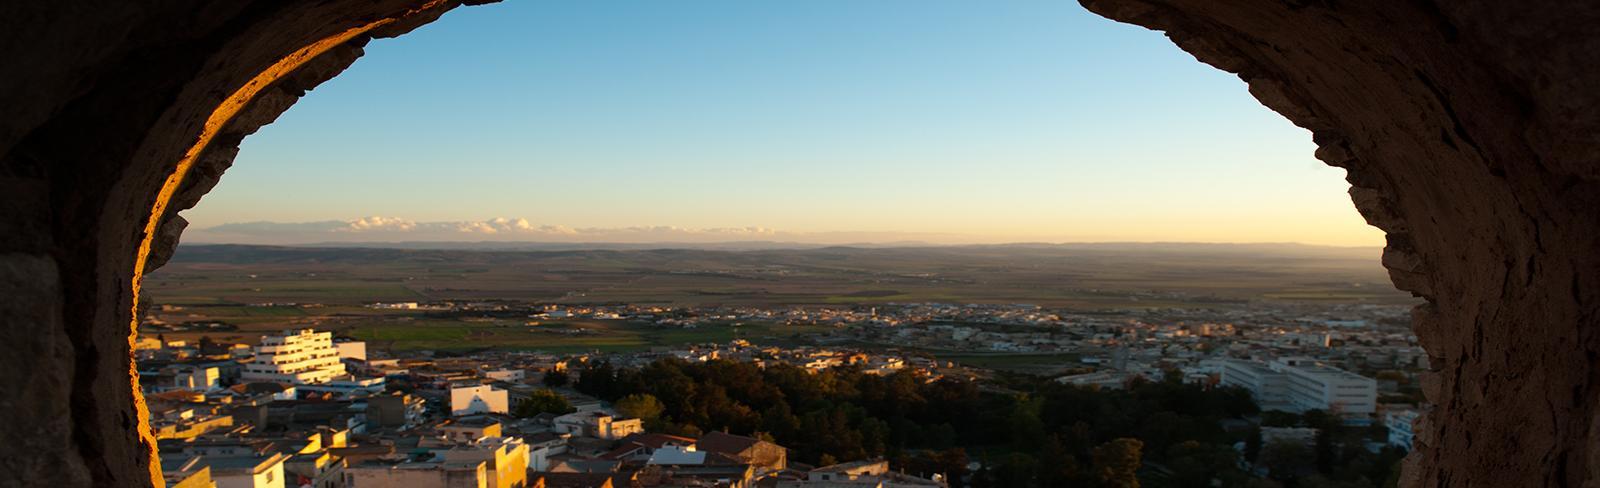 View of El Kef medina, phographed from the Grand Fort. El Kef.